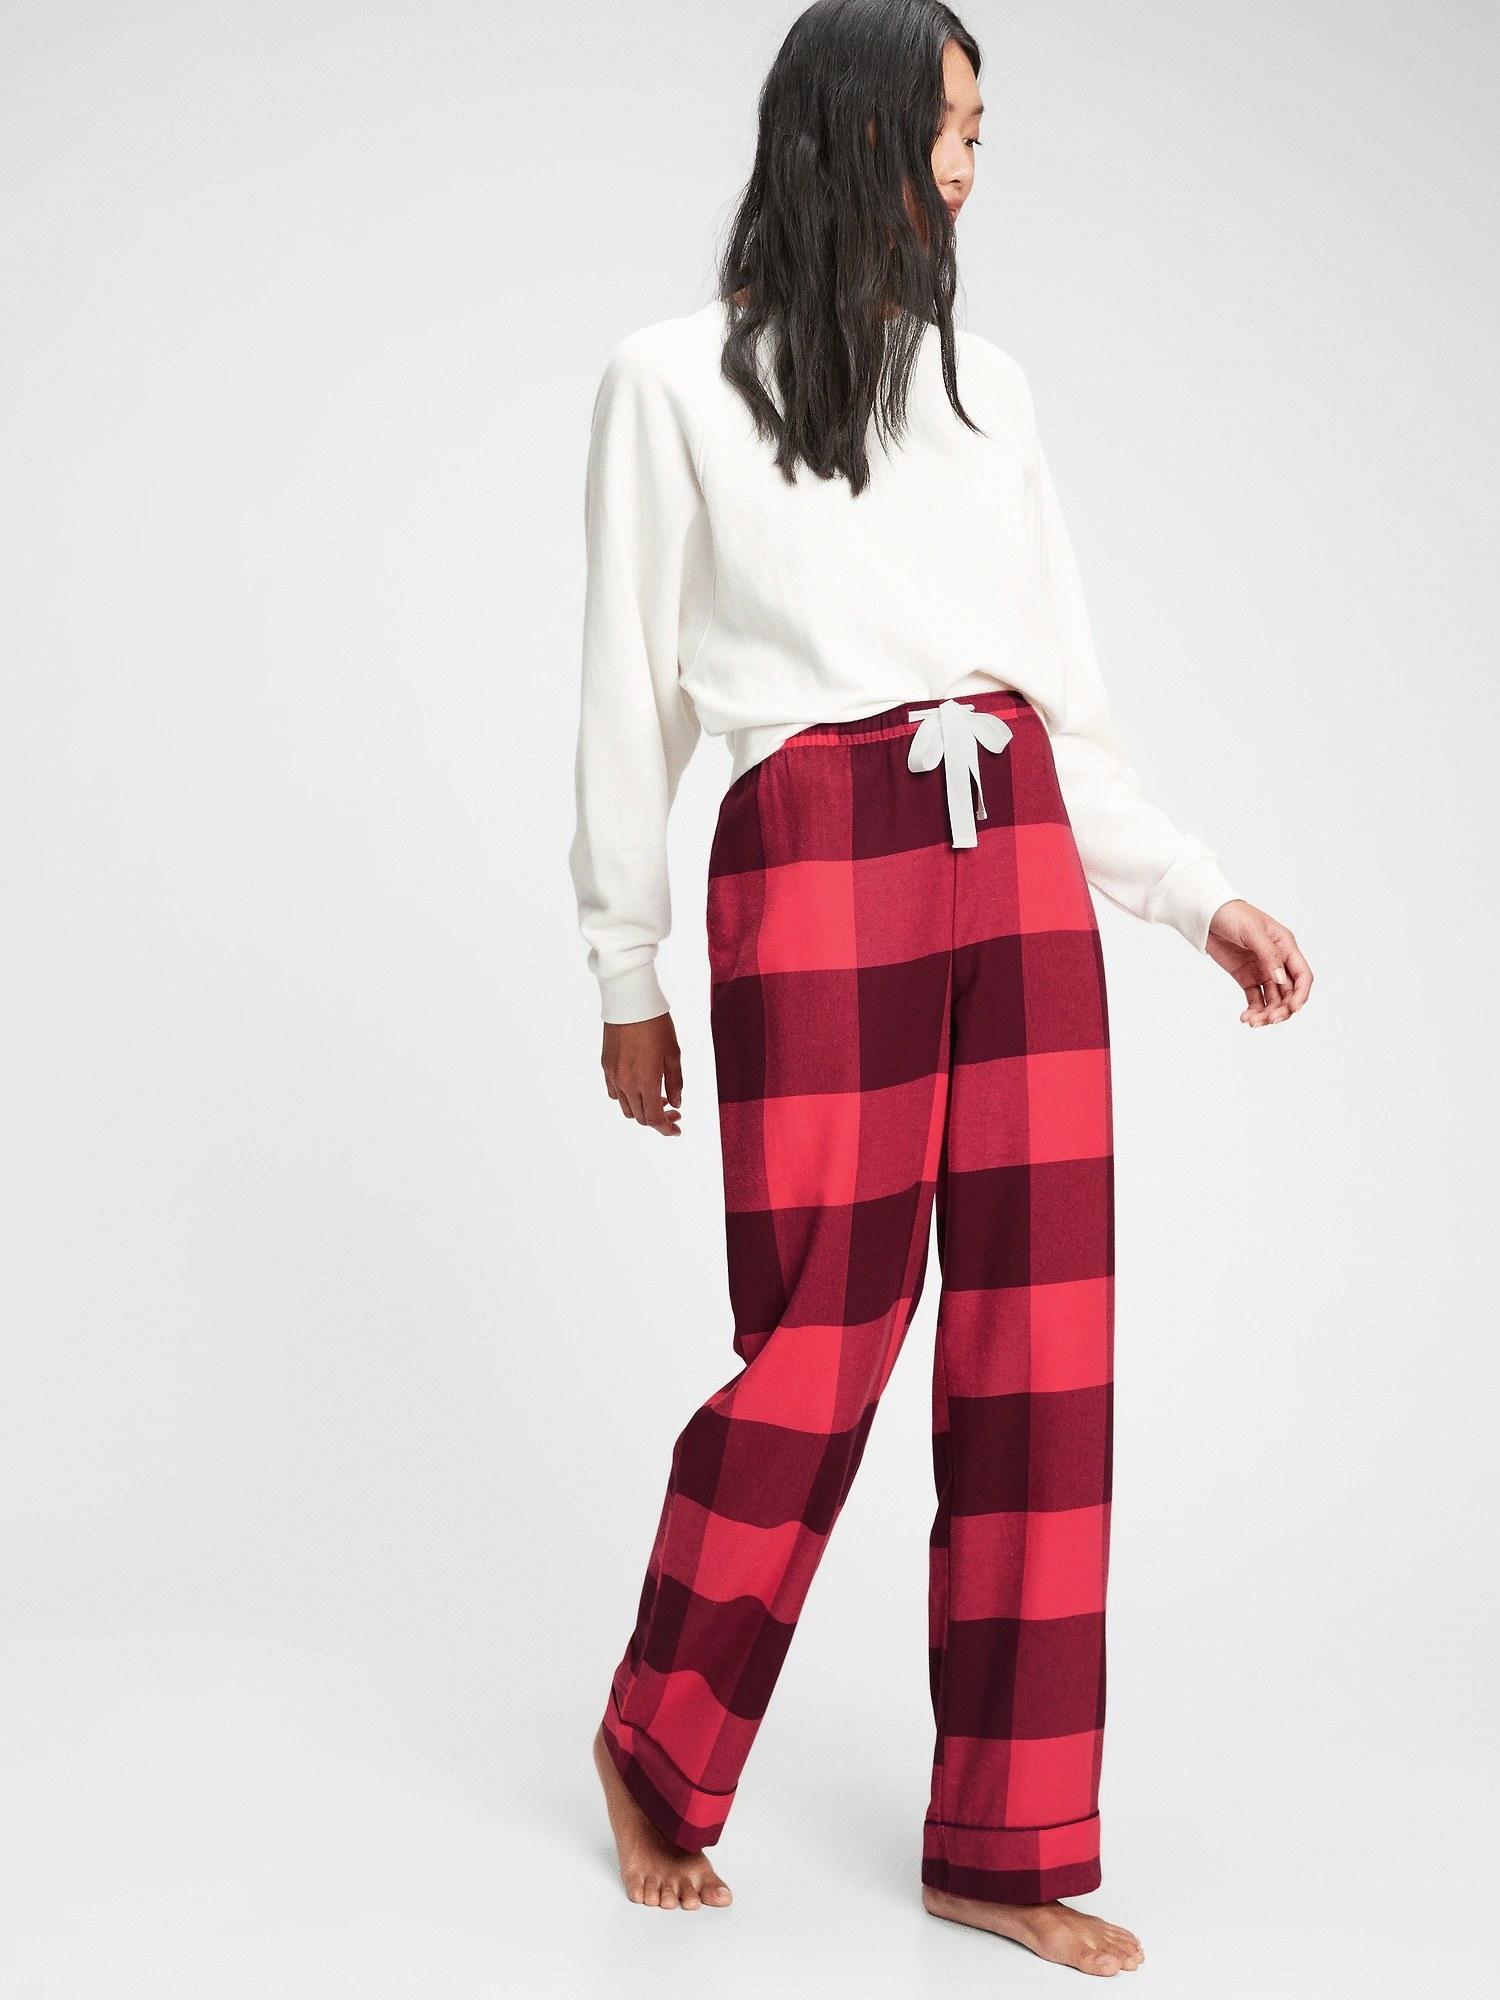 Model wearing flannel pajama pants